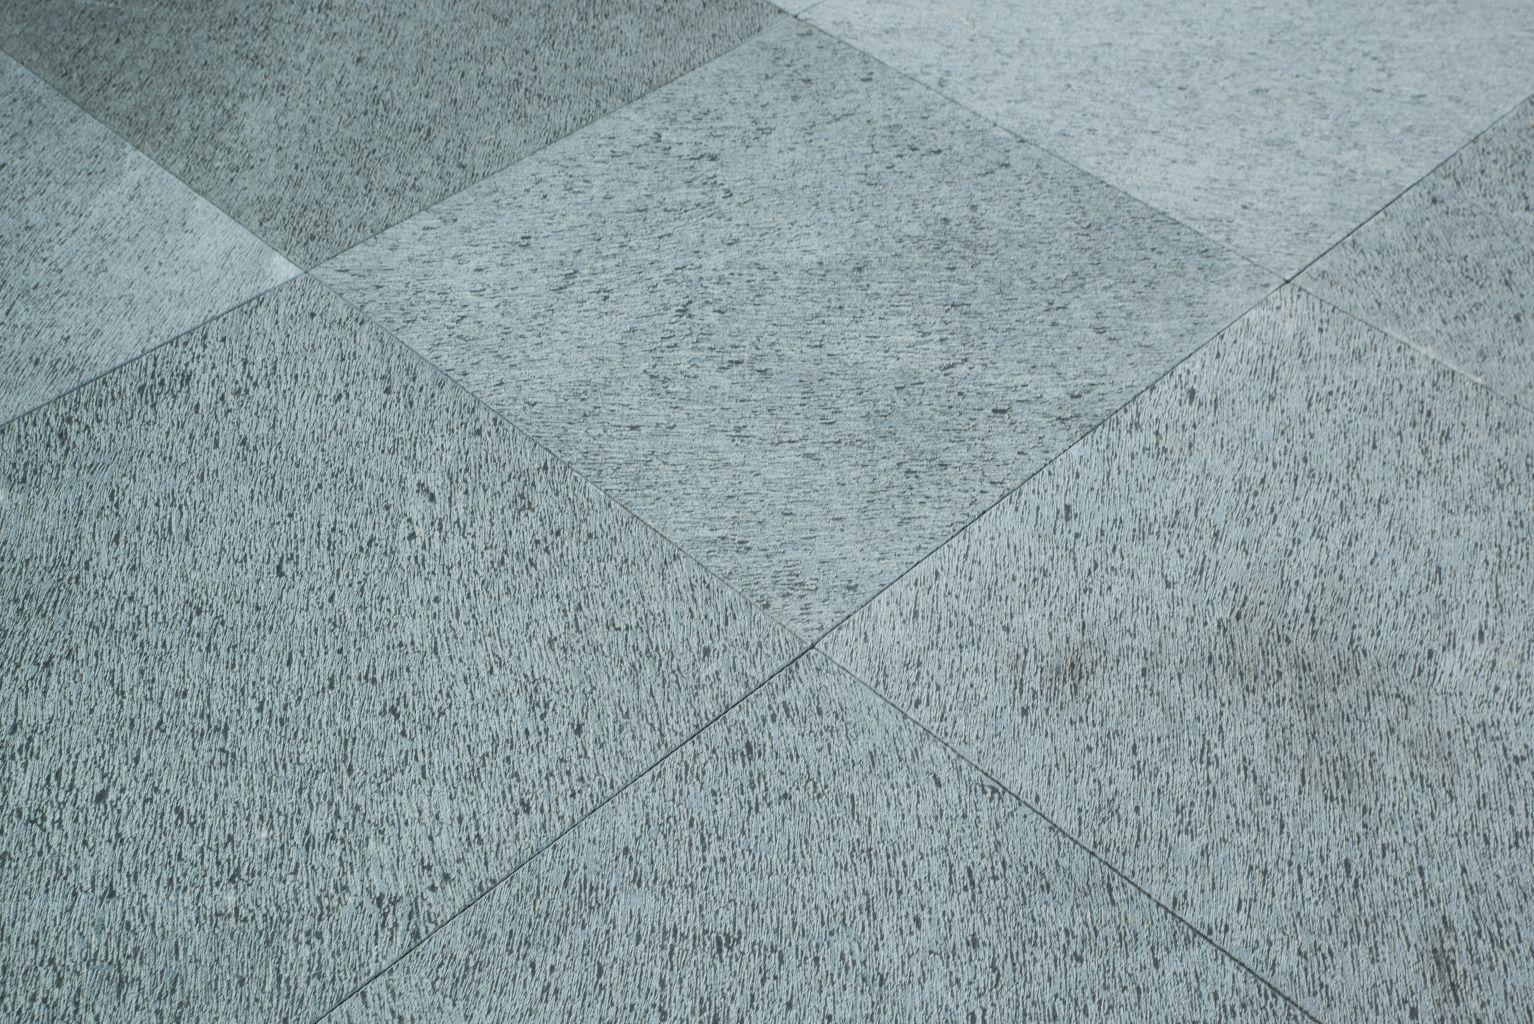 Stone paving in chiseled basalt for Basalt pavers